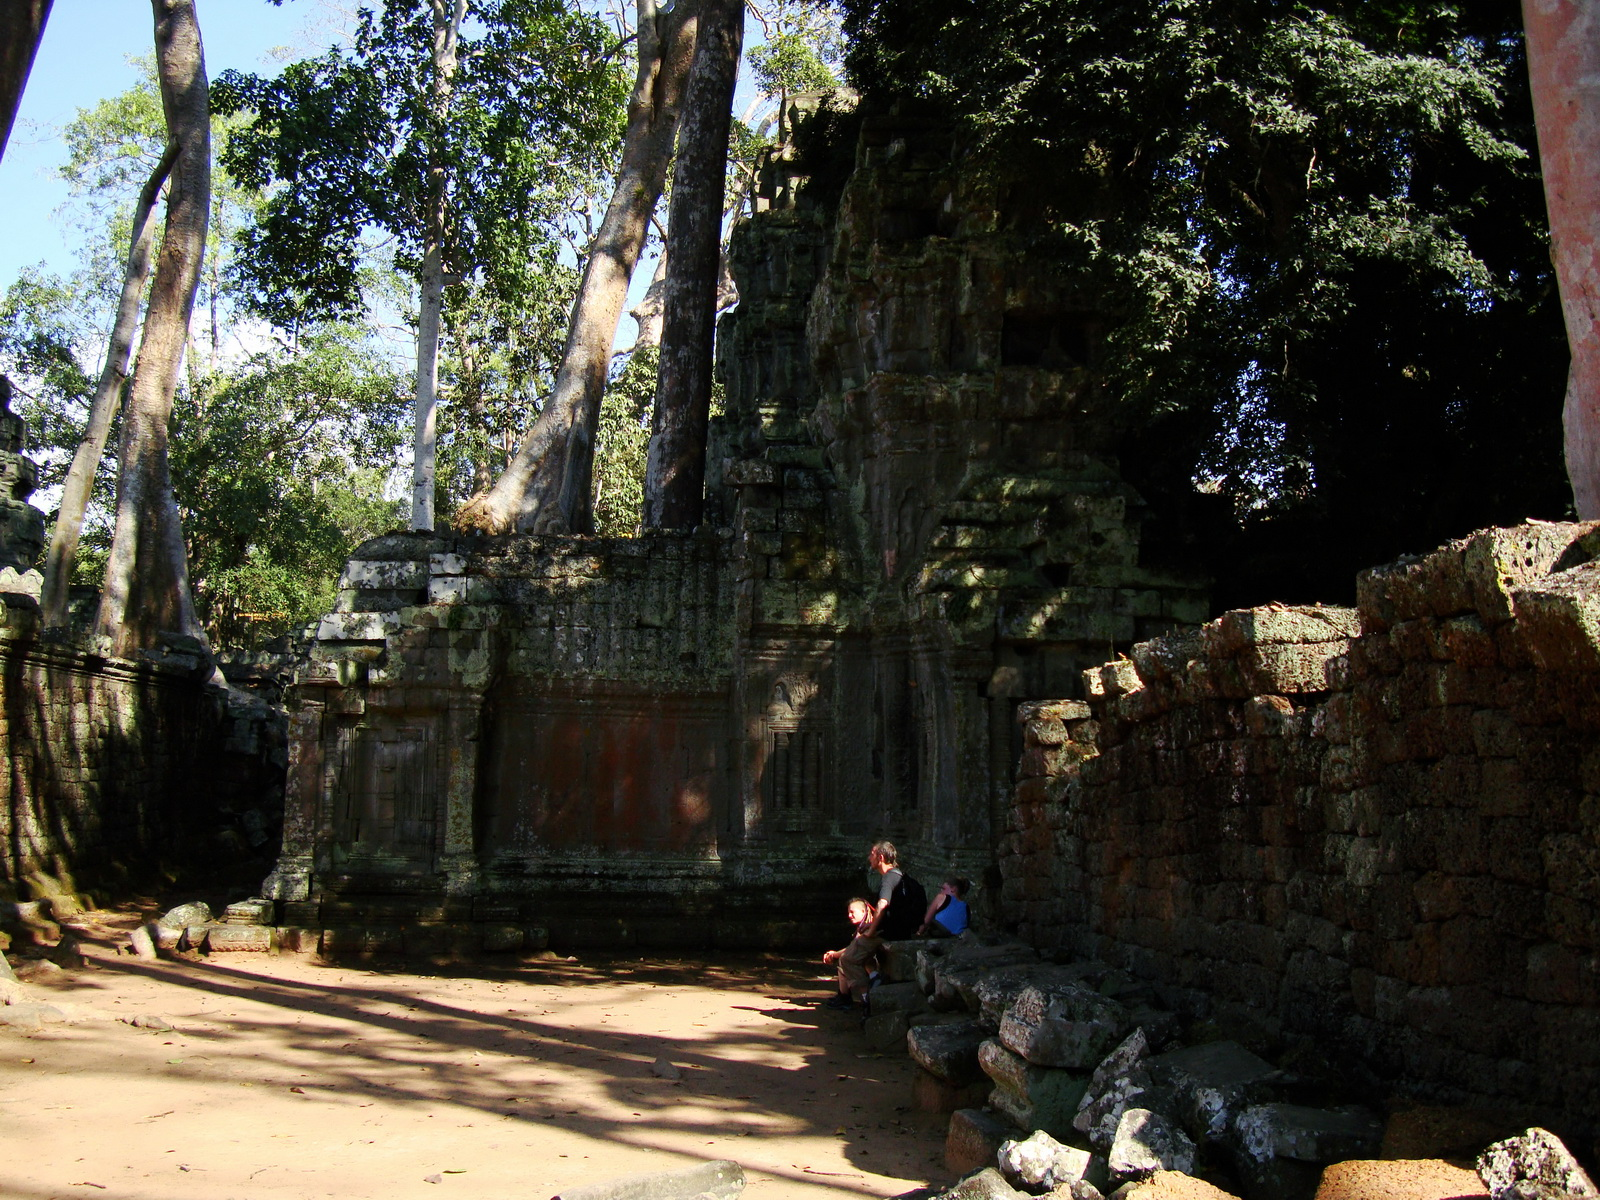 Ta Prohm Temple Tomb Raider giant iconic trees dwaf the gopura 06